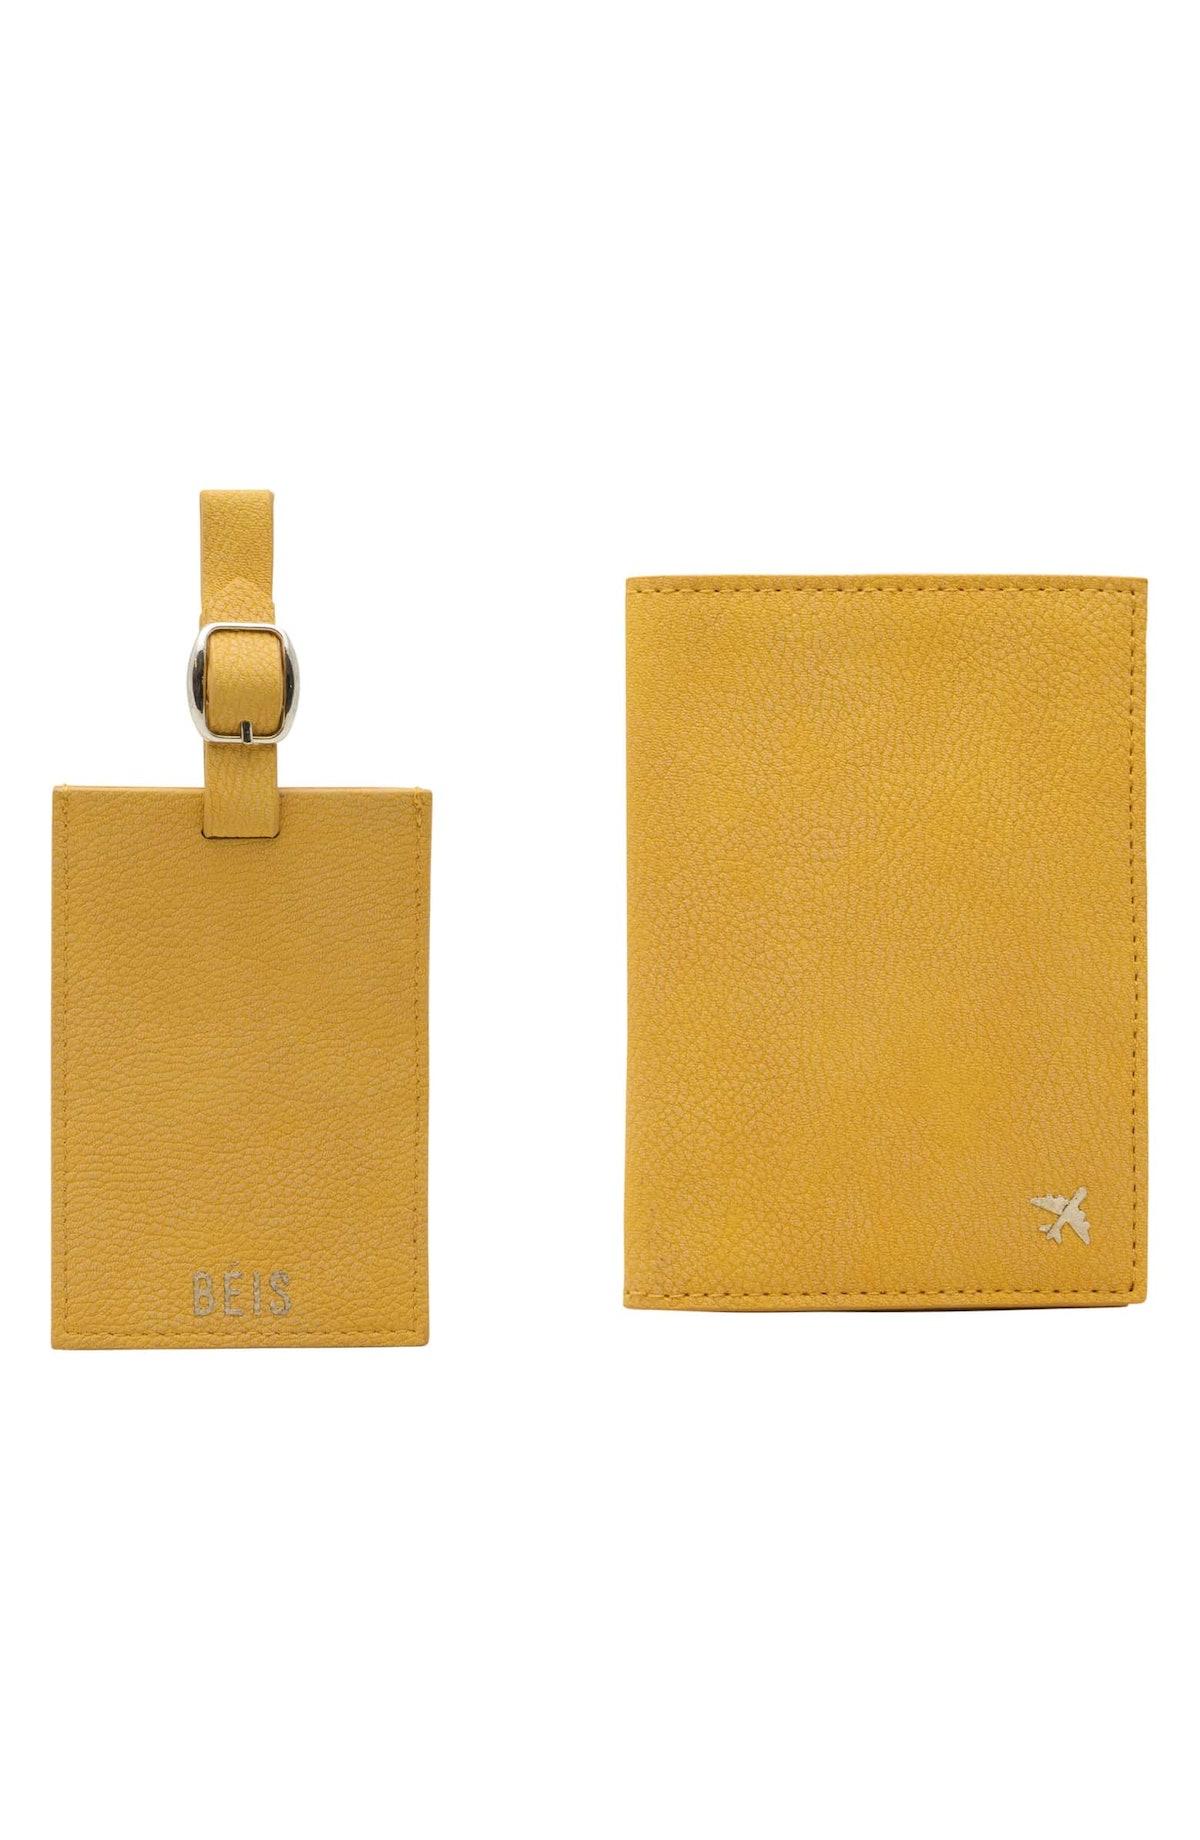 Travel Luggage Tag & Passport Holder Set